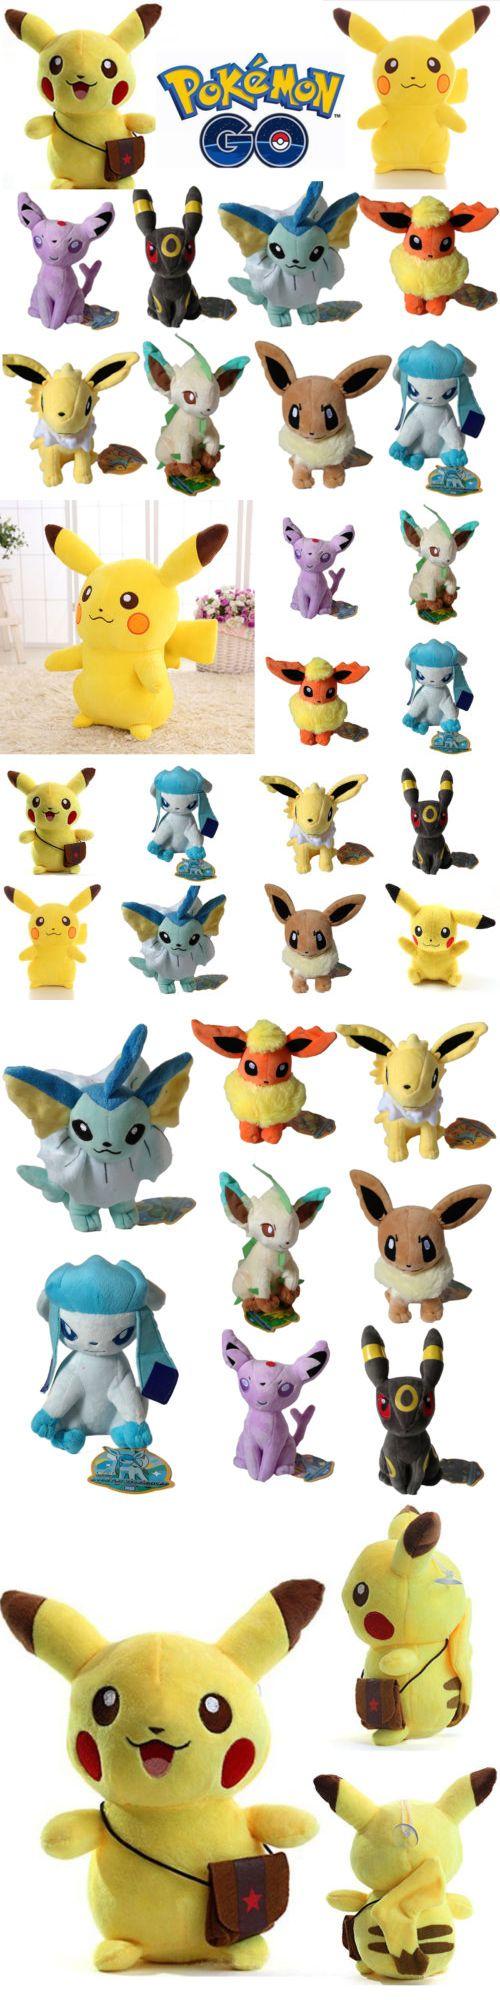 Stuffed Animals Beanbag Plush 51030: Pokemon Pikachu Eevee Collectible Plush Toy Soft Stuffed Doll Kids Children Gift -> BUY IT NOW ONLY: $37.1 on eBay!